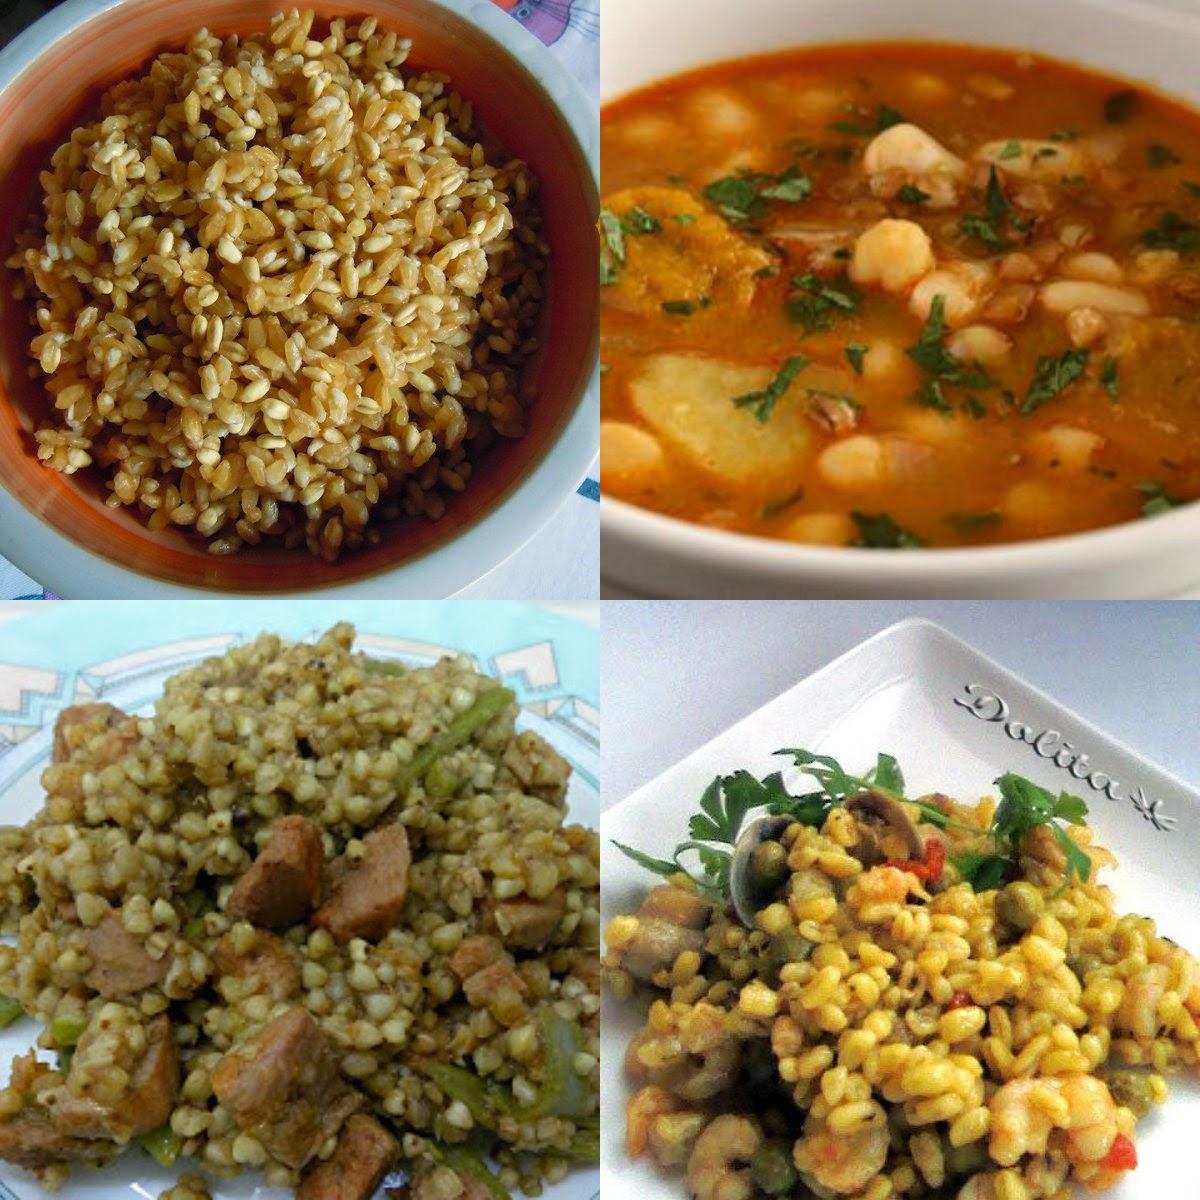 Eucligoras evoluci n y revoluci n gastronom a peruana for Cocinar trigo